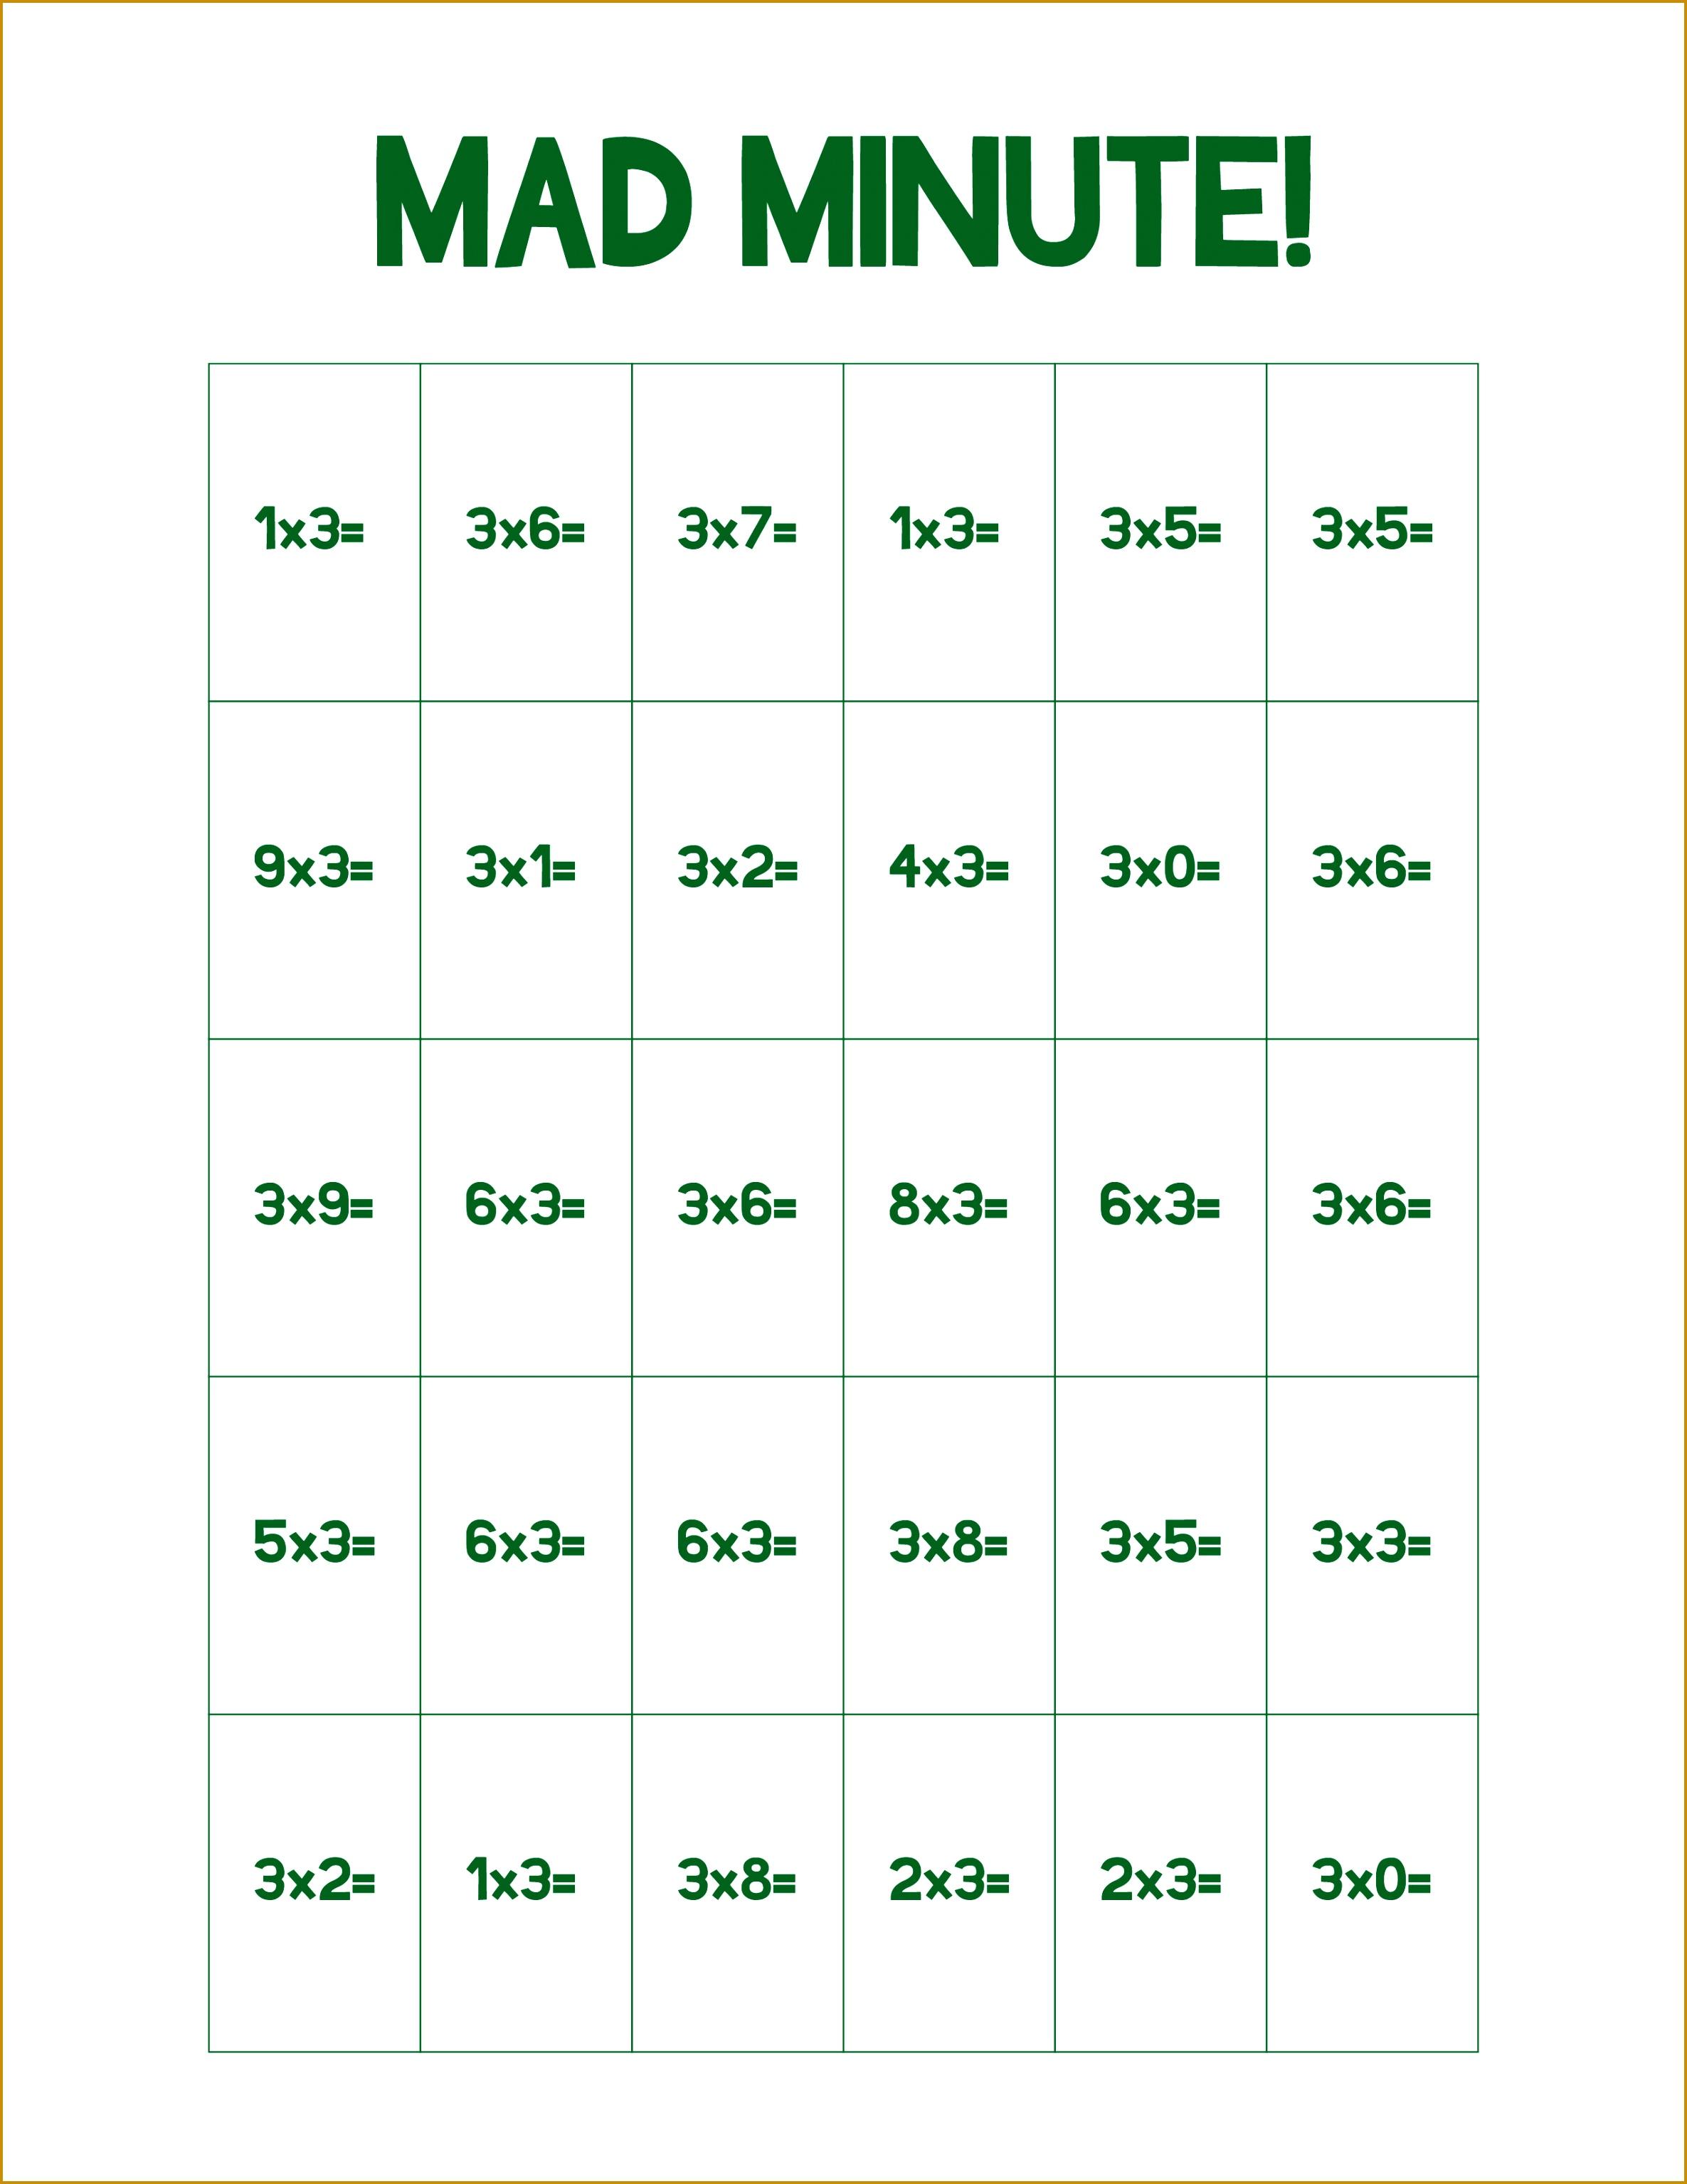 7 Math Worksheets 4 Kids